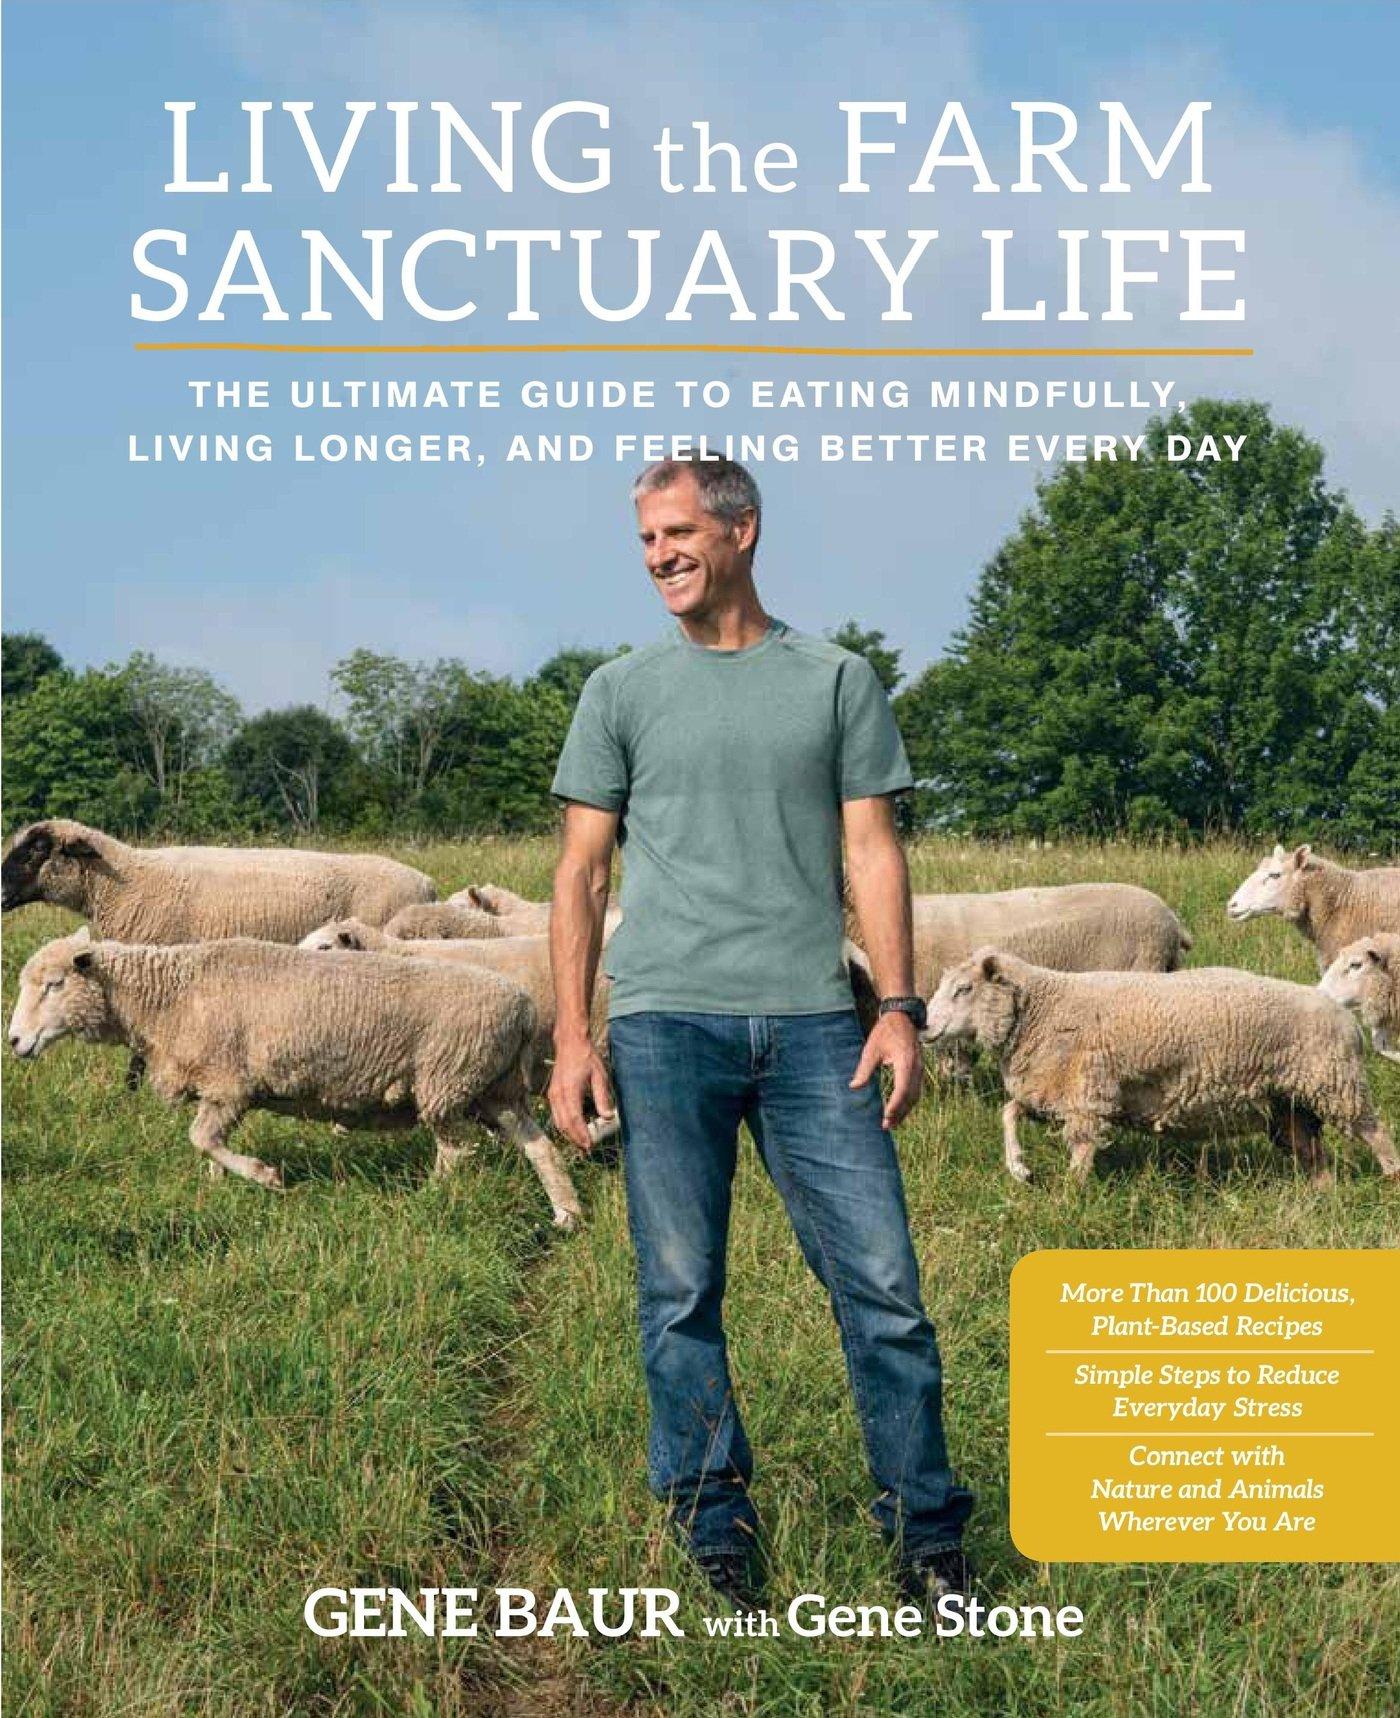 """Living the Farm Sanctuary Life"" by Gene Baur"